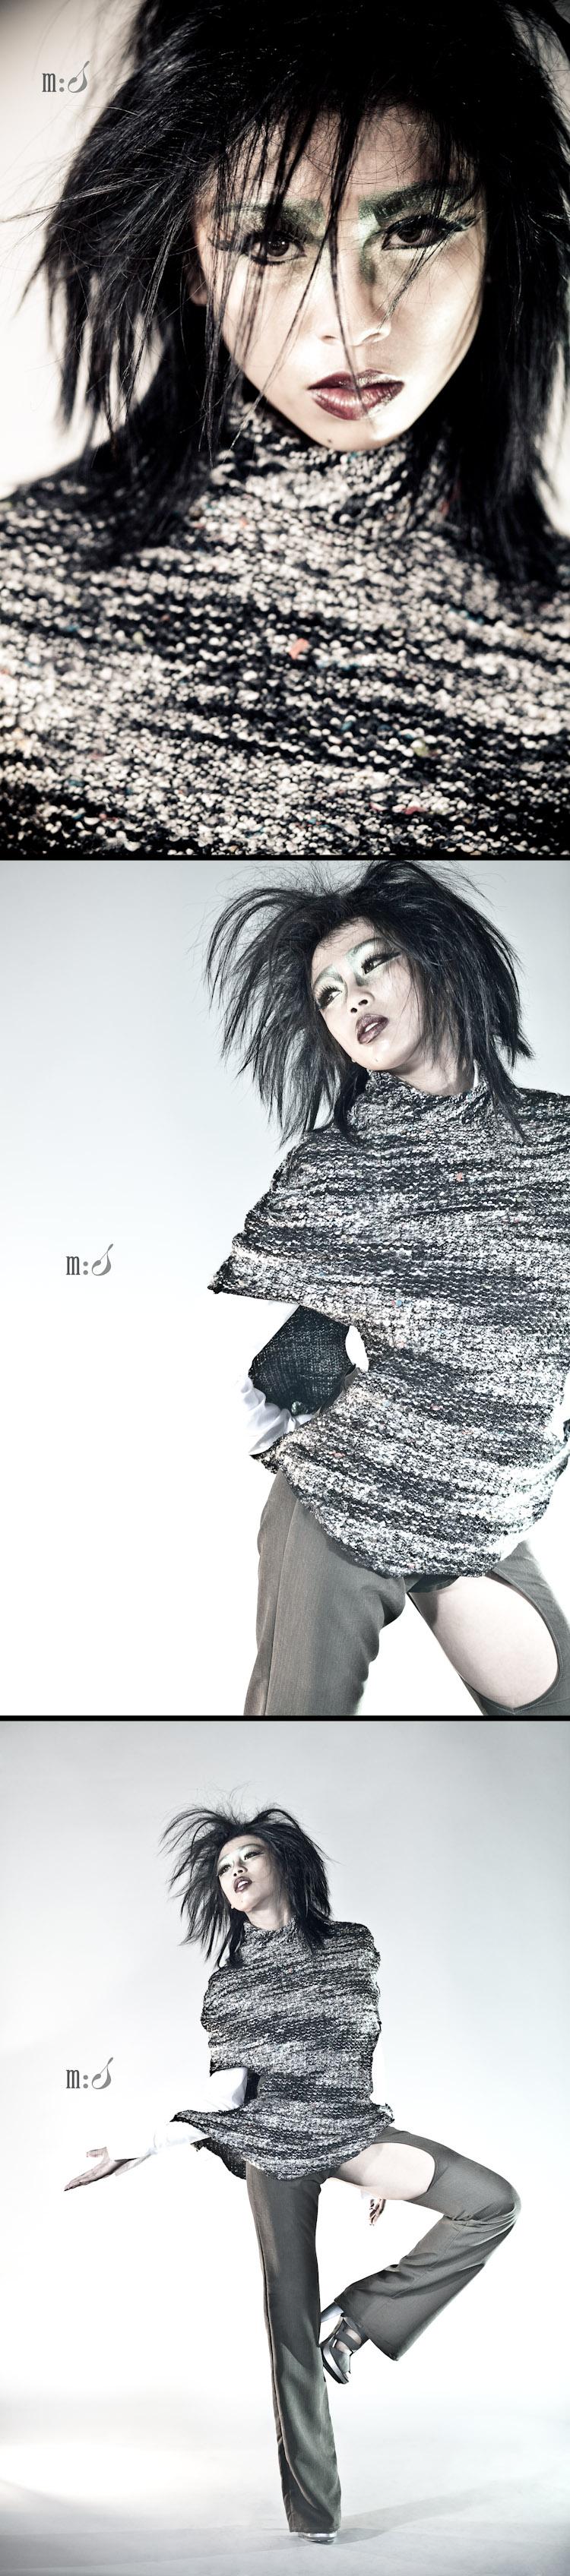 Female model photo shoot of Angelie Marie Flores by maxwellstudios, hair styled by Jason Becker, makeup by Brittni Lynn  M U A , clothing designed by Raine De Vant